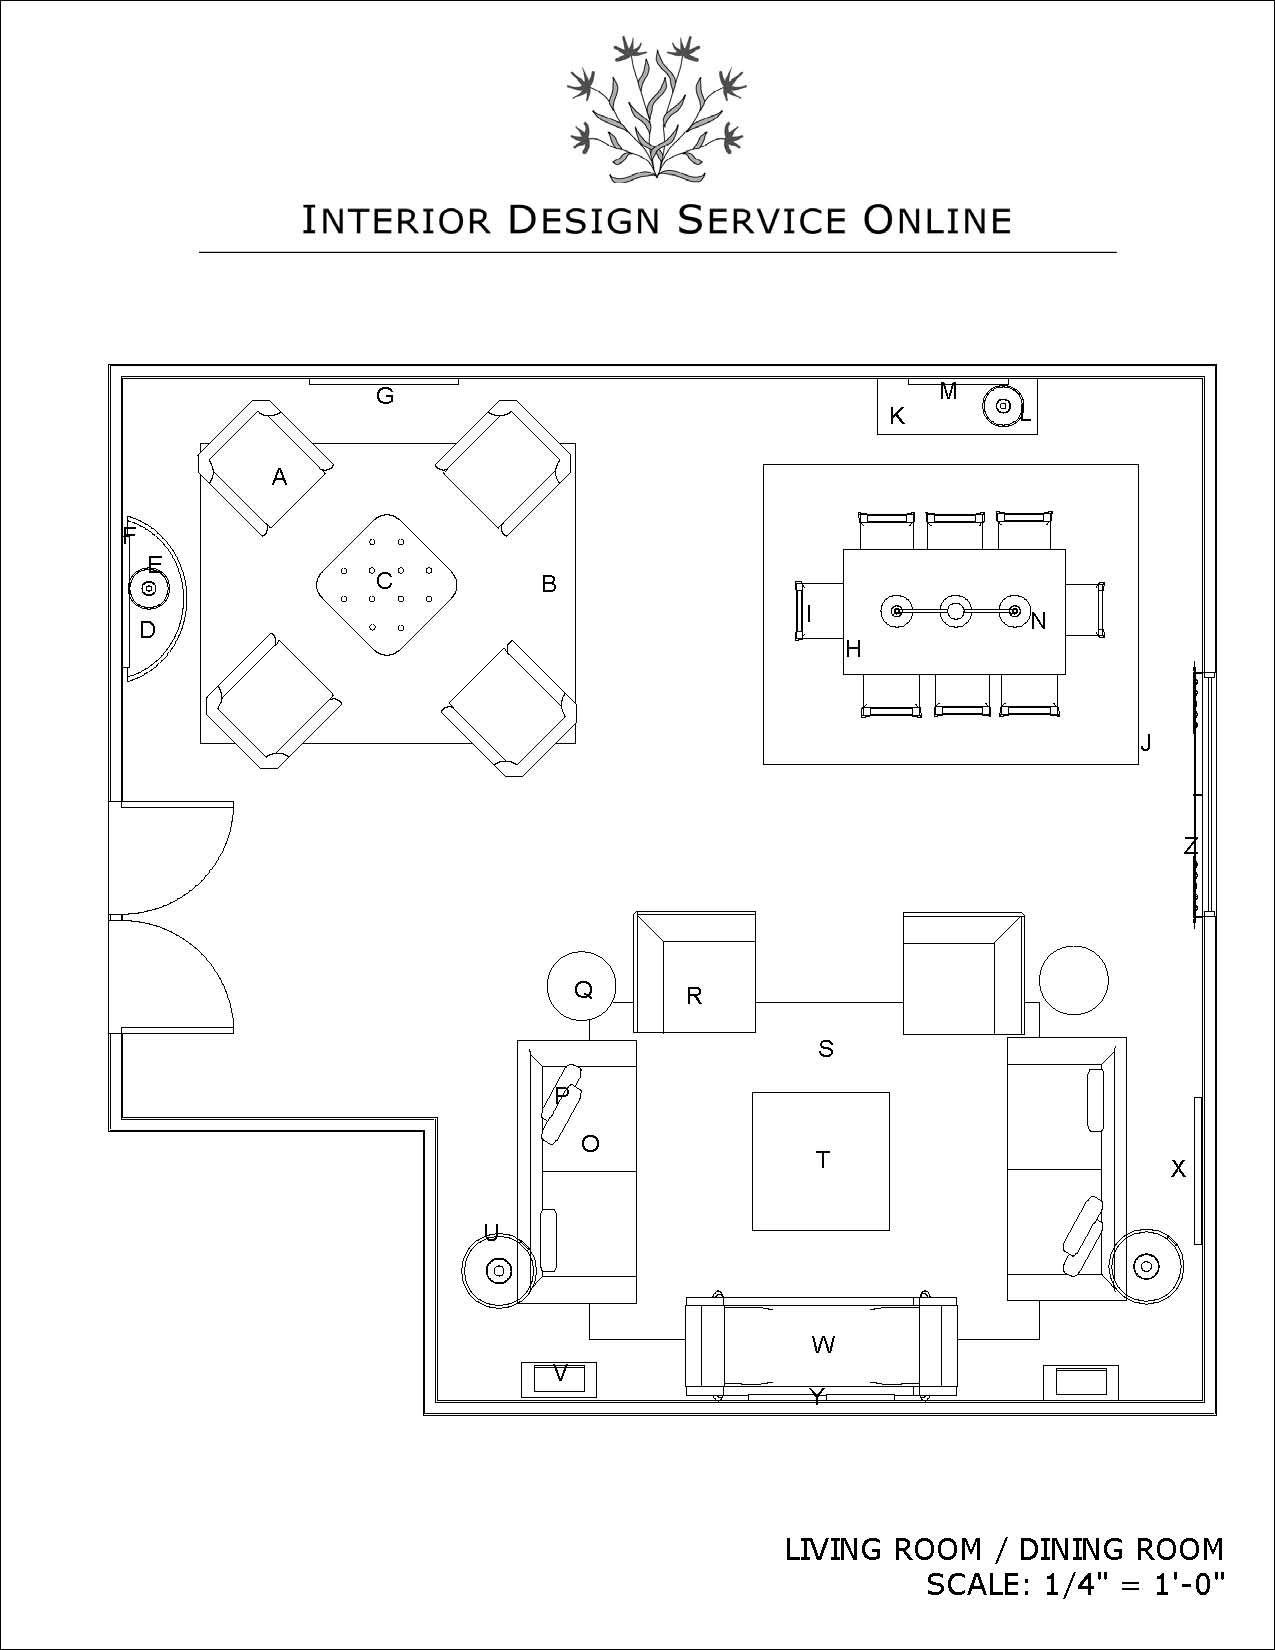 Http Www Interiordesignserviceonline Com Living Room Dining